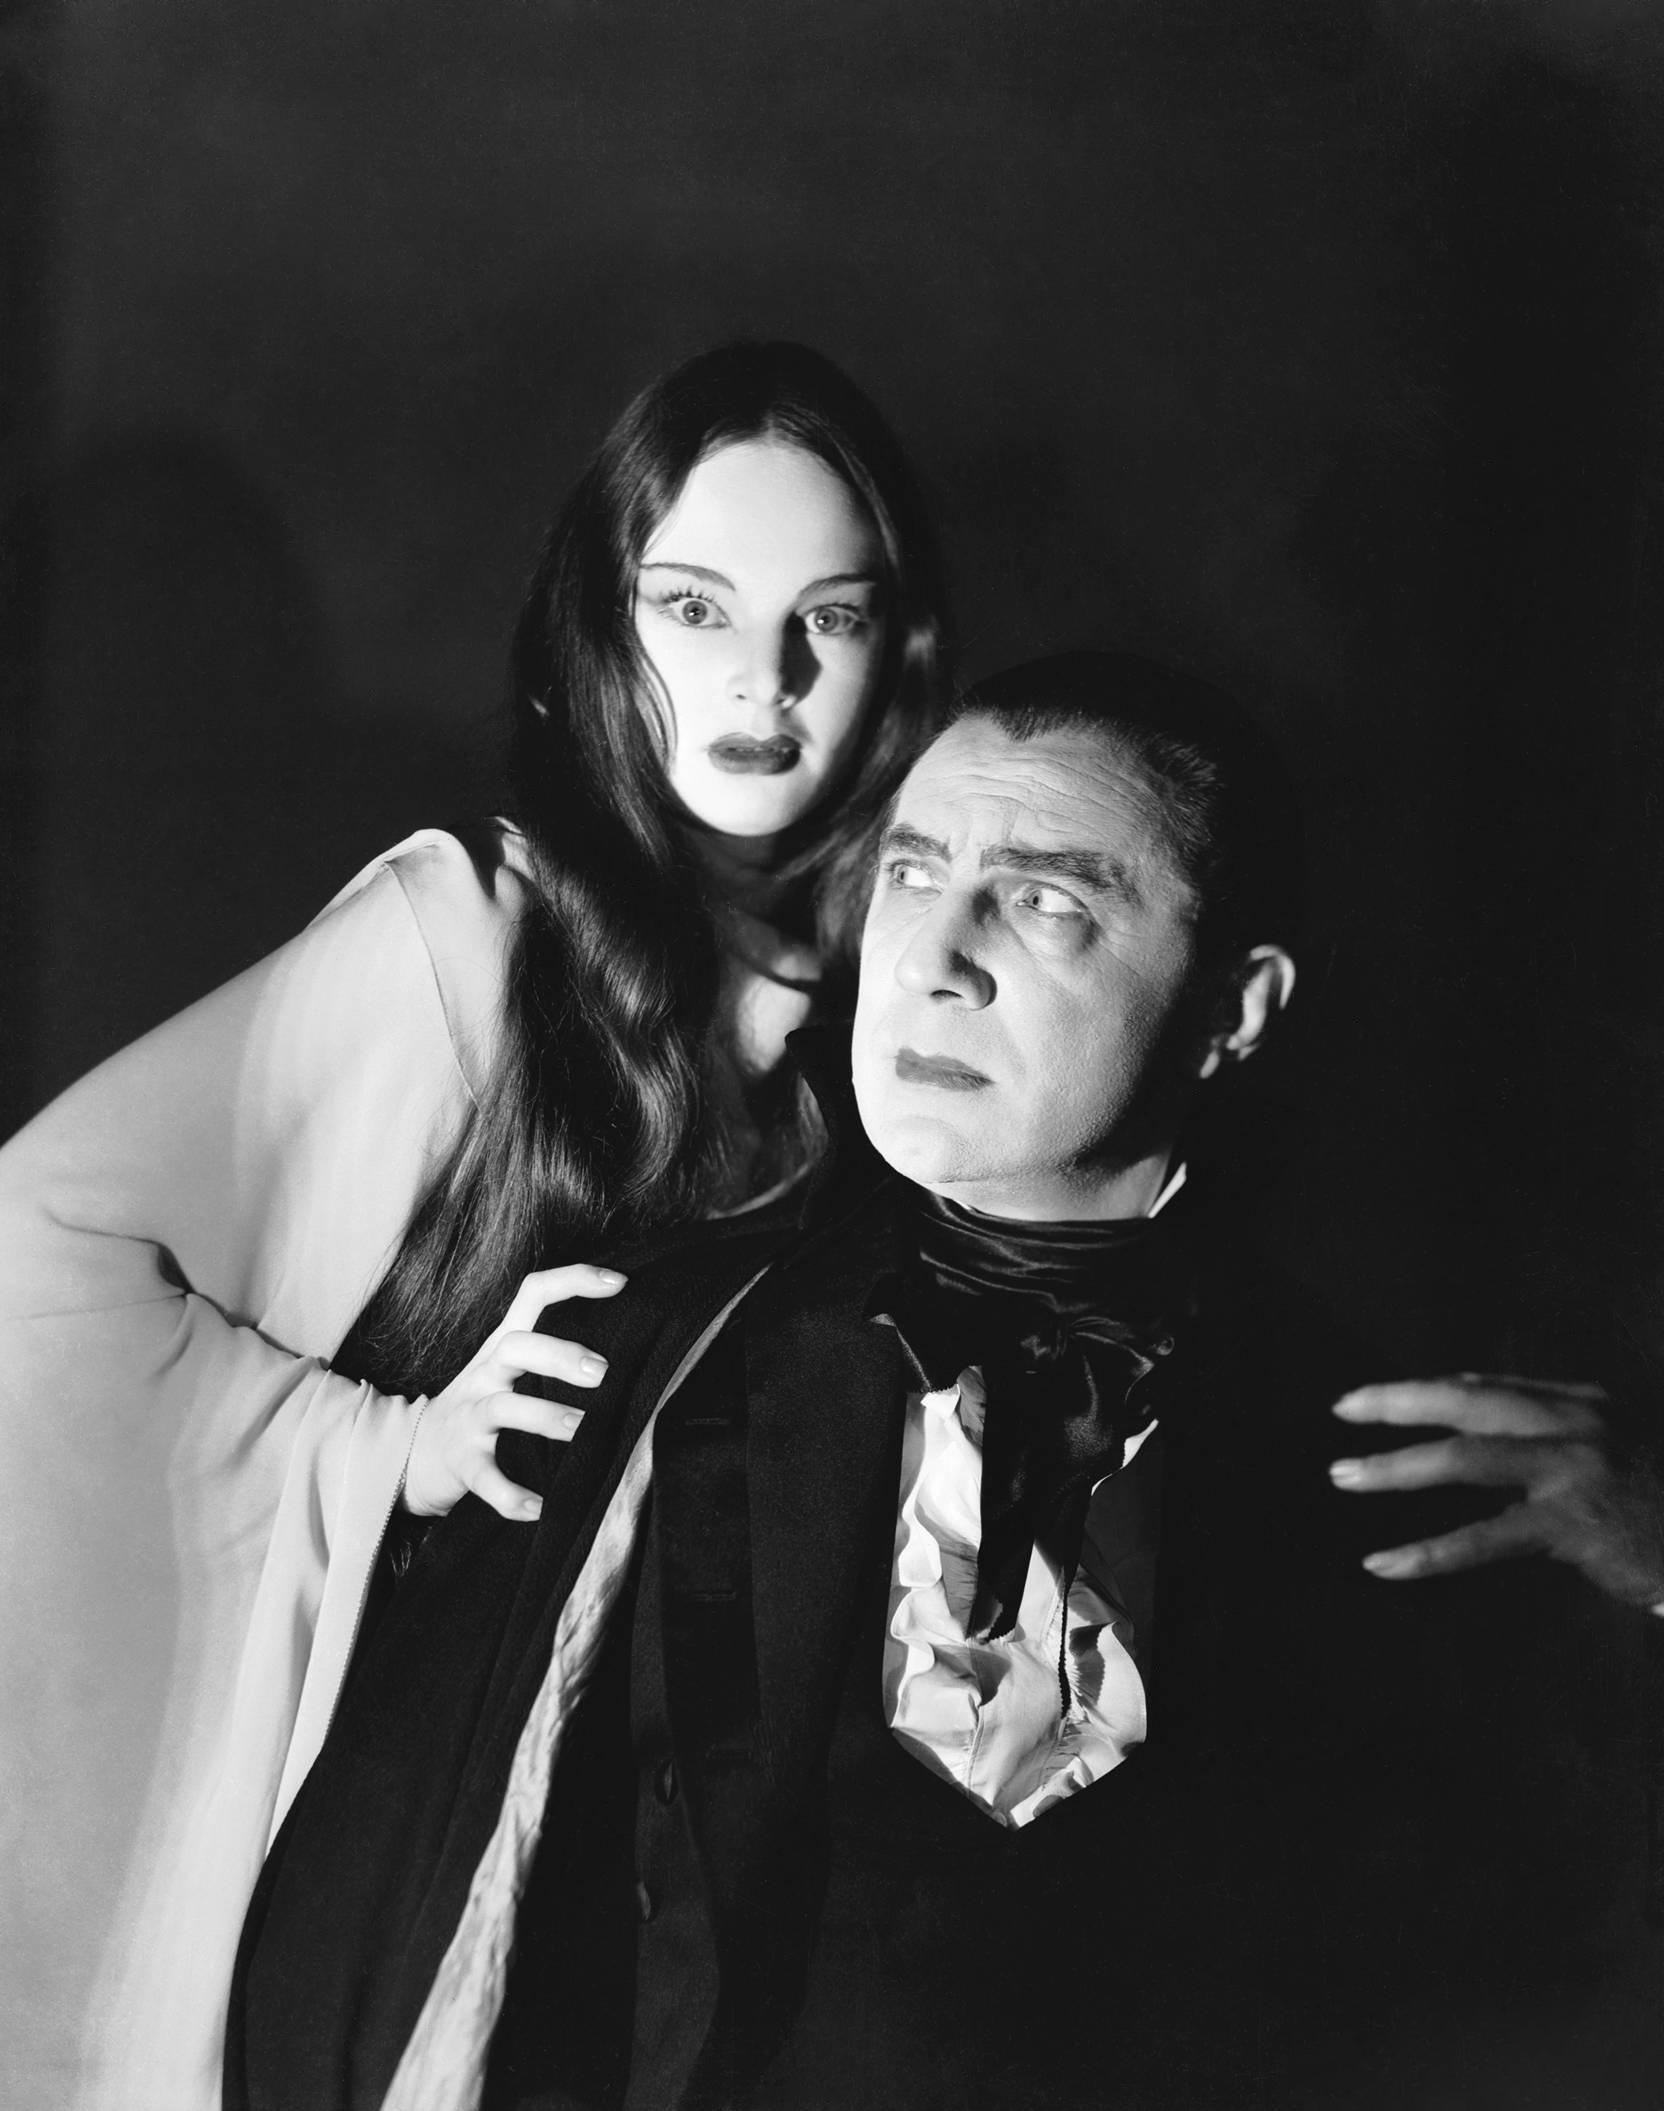 Annex - Lugosi, Bela (Mark of the Vampire)_01